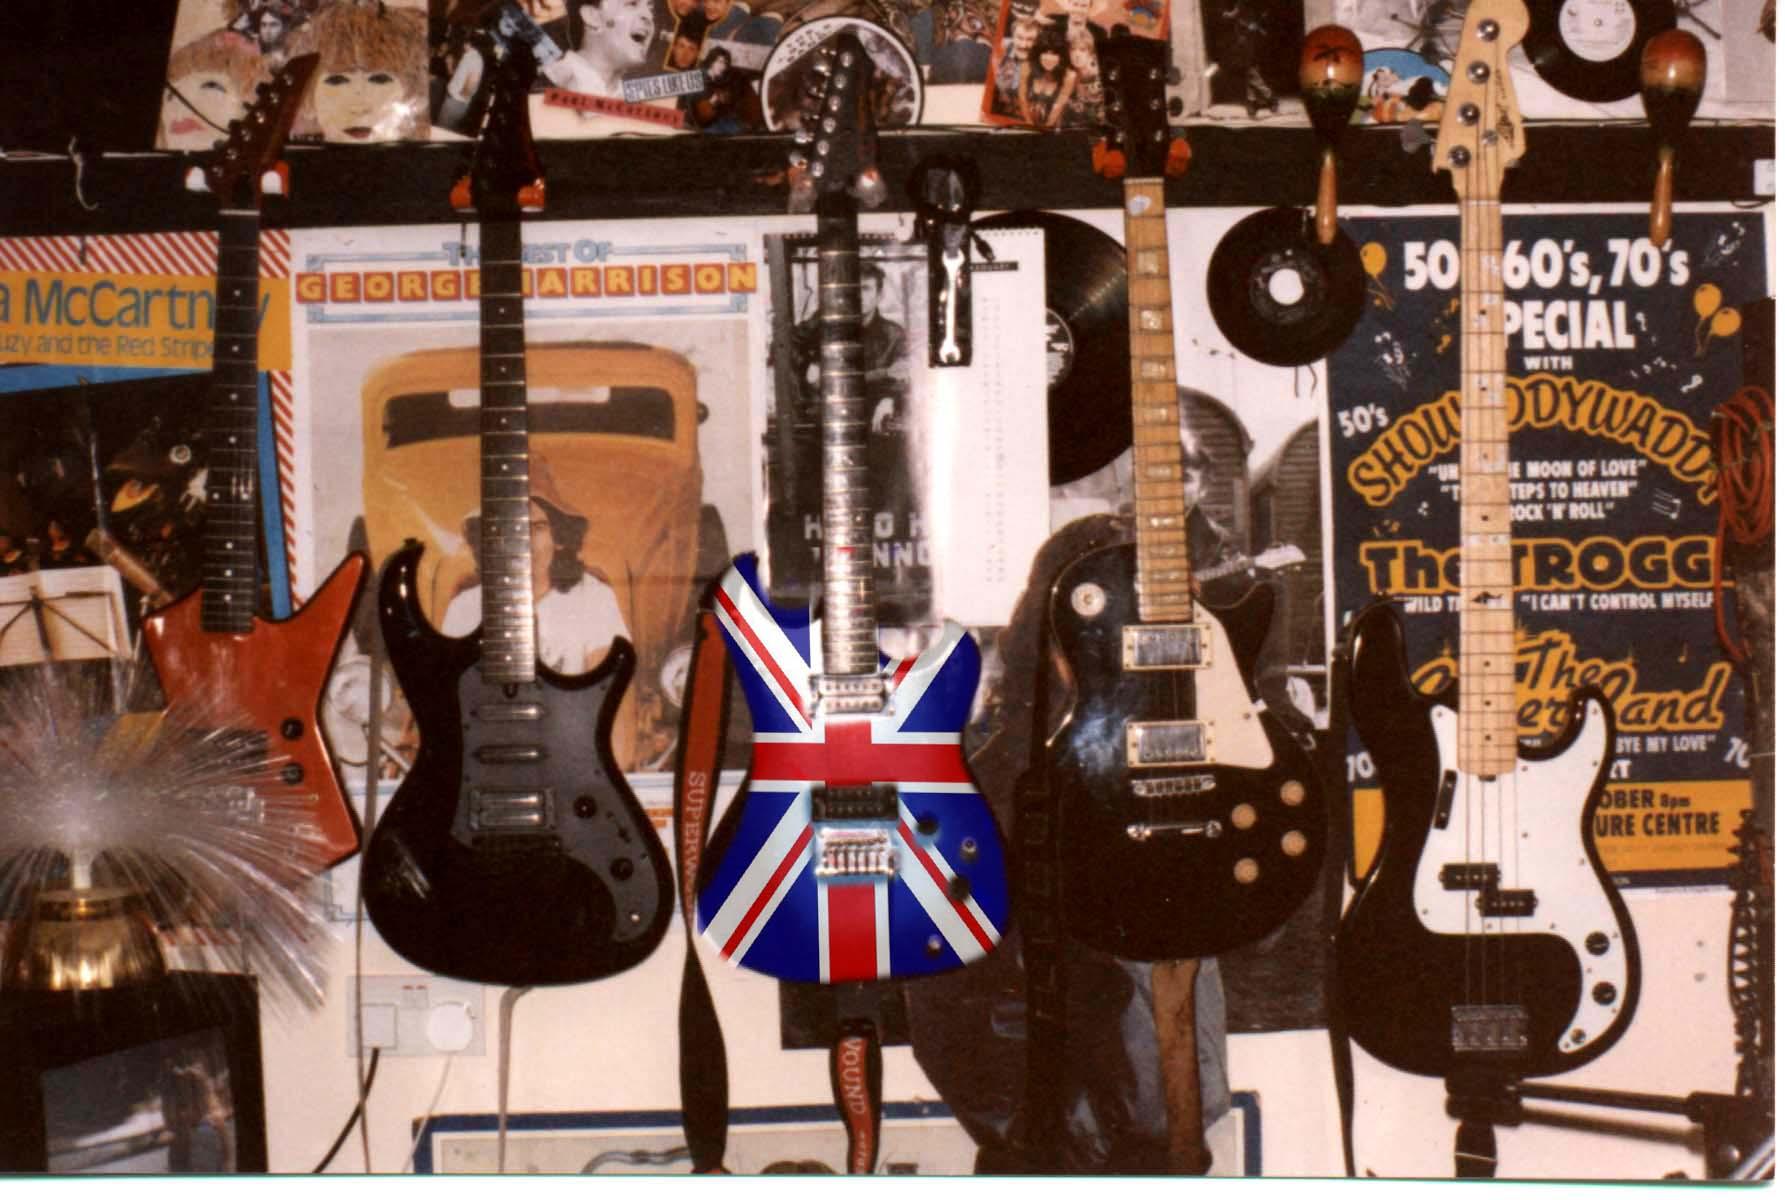 File:Badgreeb fattkatt old guitars, soon to be , union jack